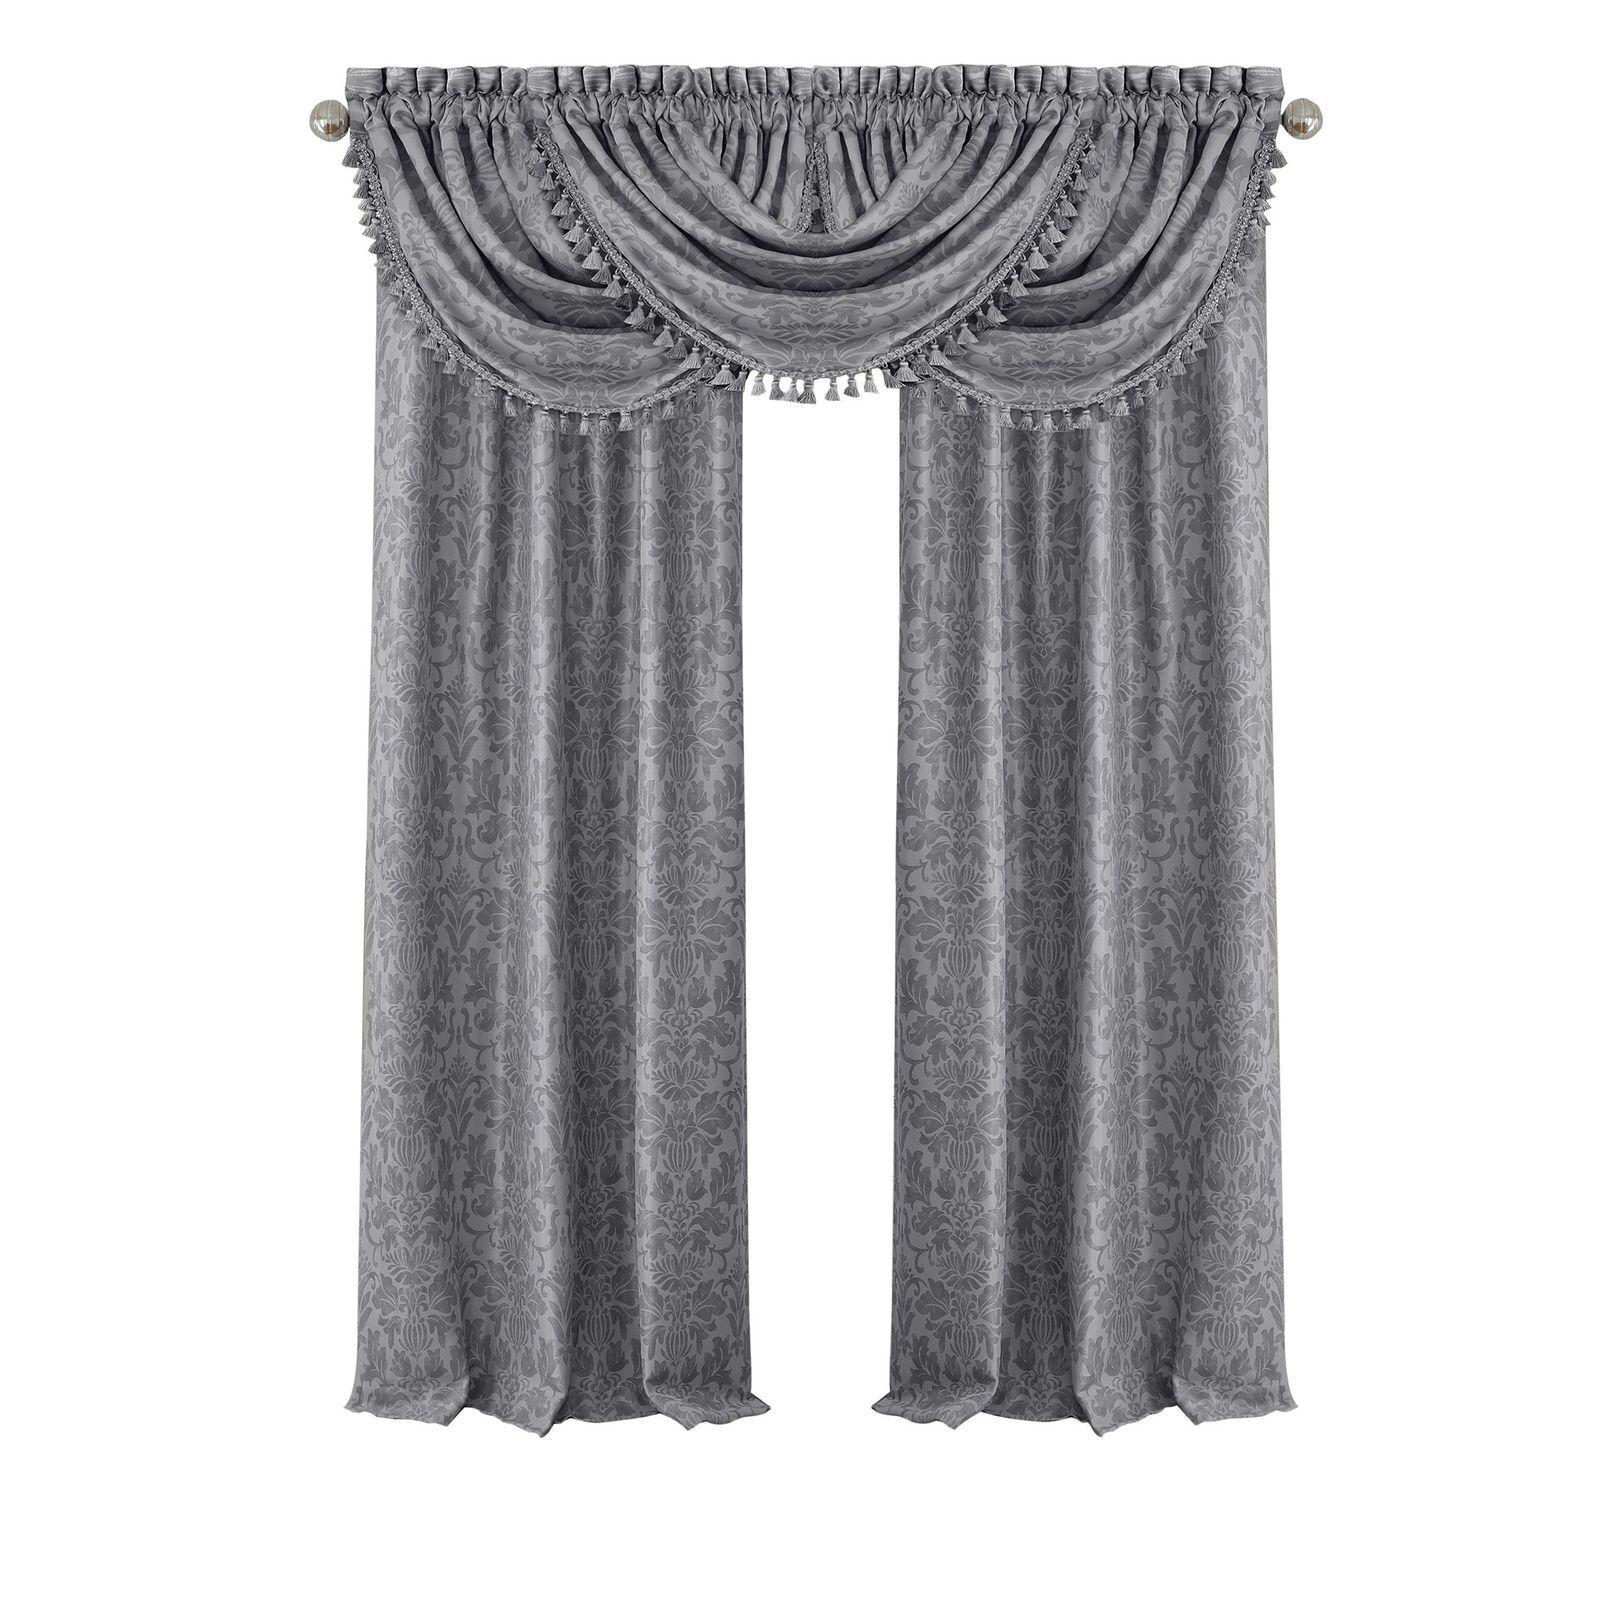 "95"" window Curtain set Includes Waterfall Valance Elrene Ant"